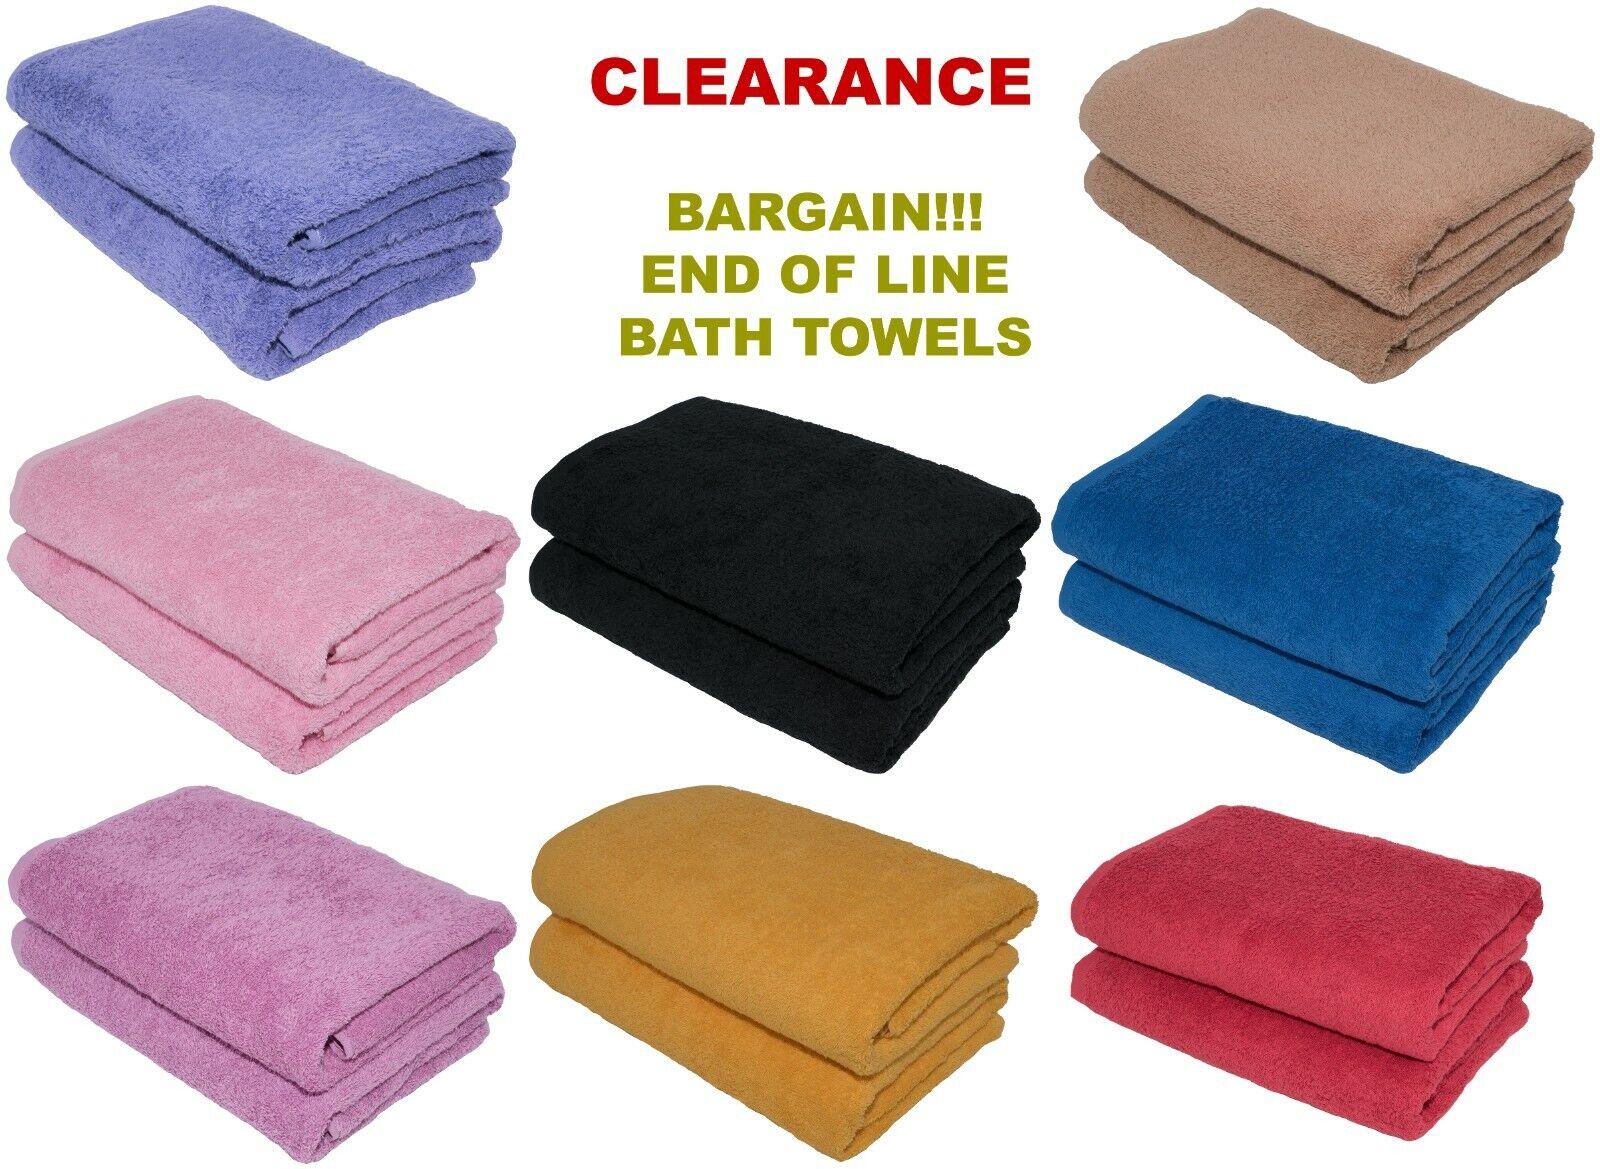 CLEARANCE Wholesale Job Lot Large Bath Towel 70x140 cm, 500 GSM Hotel Quality